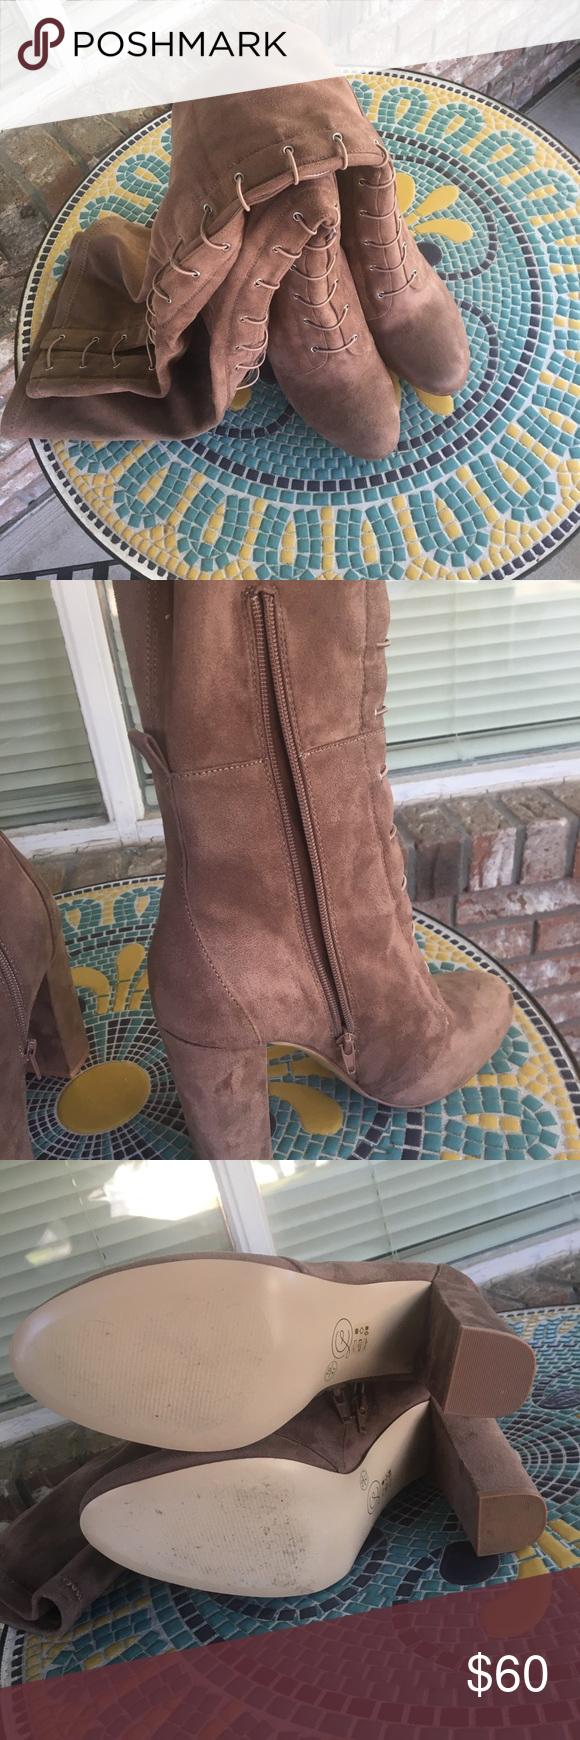 9558190293e Chinese Laundry Benita Over The Knee Boot. Worn once. Size 10 Chinese  Laundry Shoes Over the Knee Boots